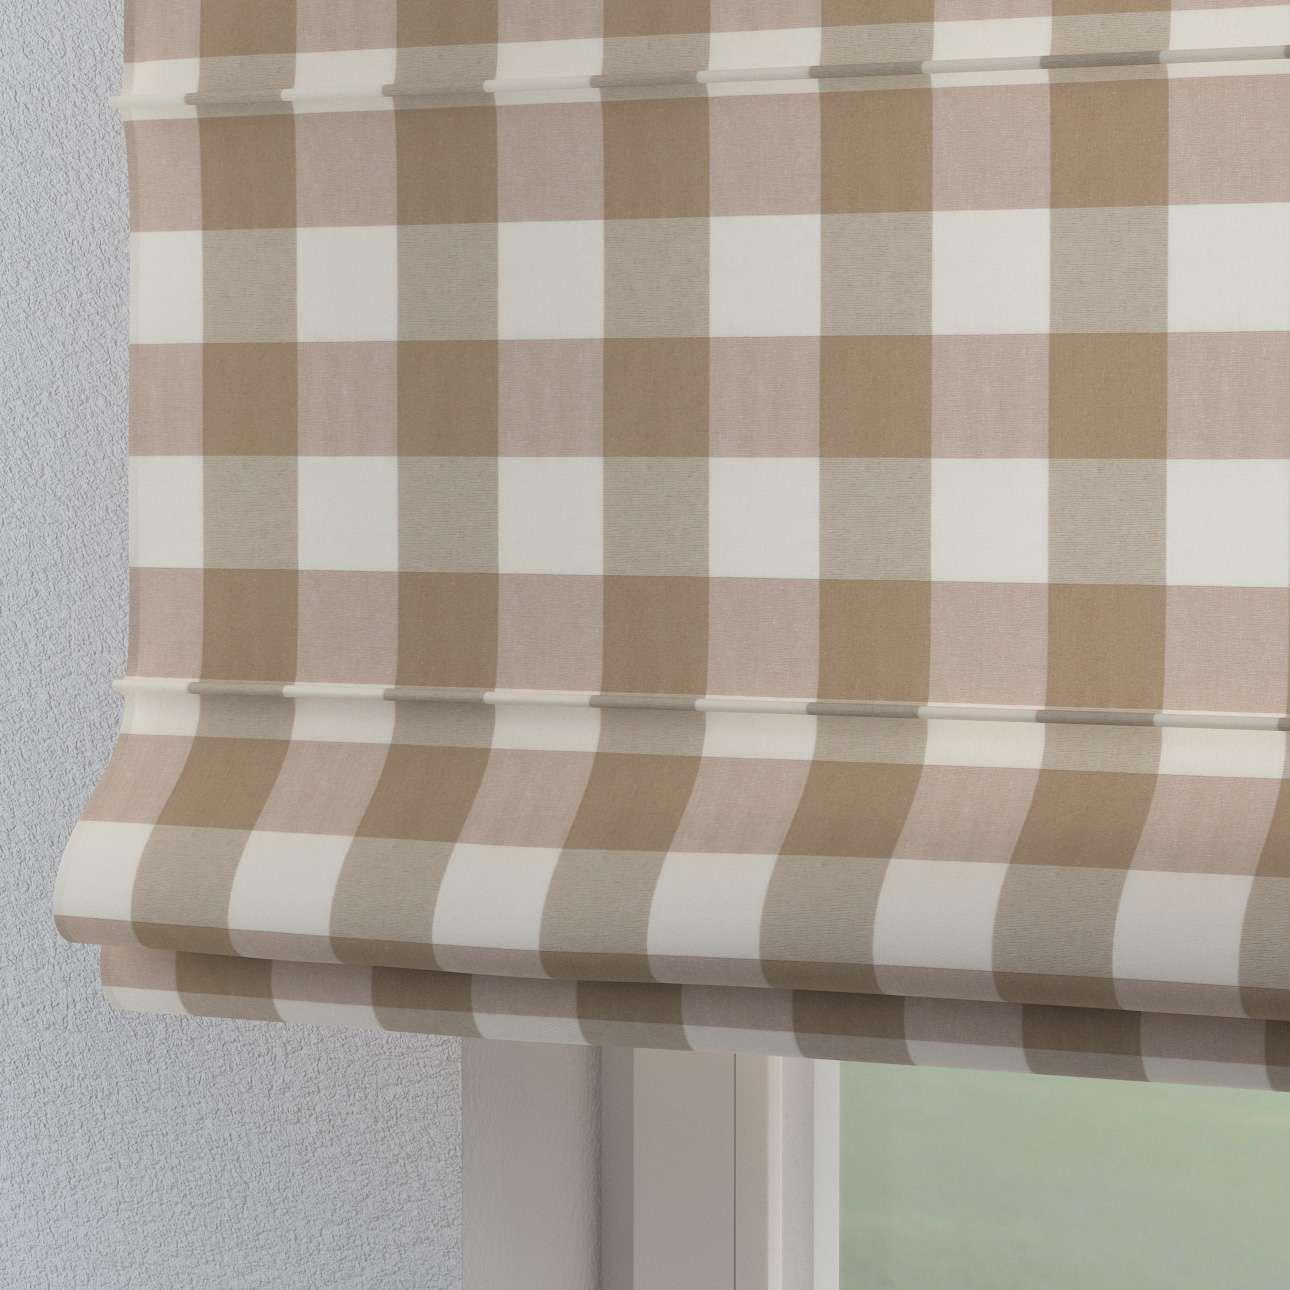 Roleta rzymska Torino 130×170cm w kolekcji Quadro, tkanina: 136-08